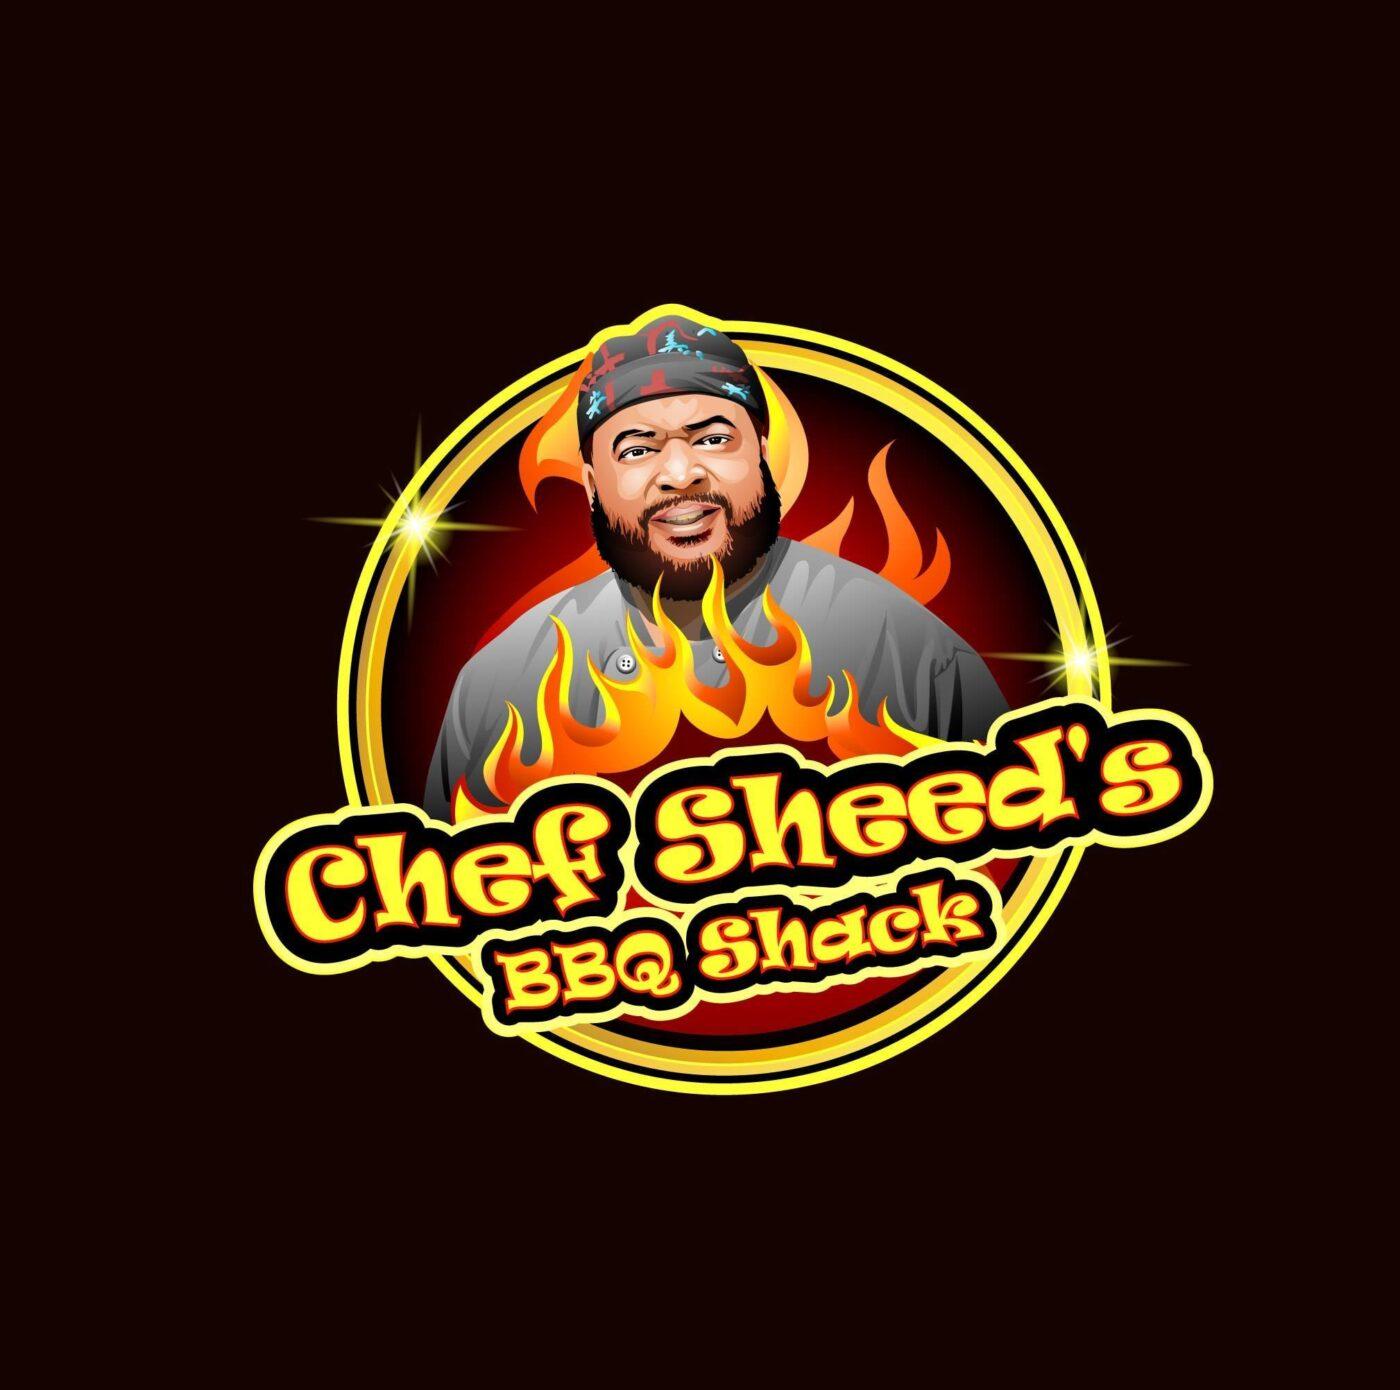 Chef Sheeds2